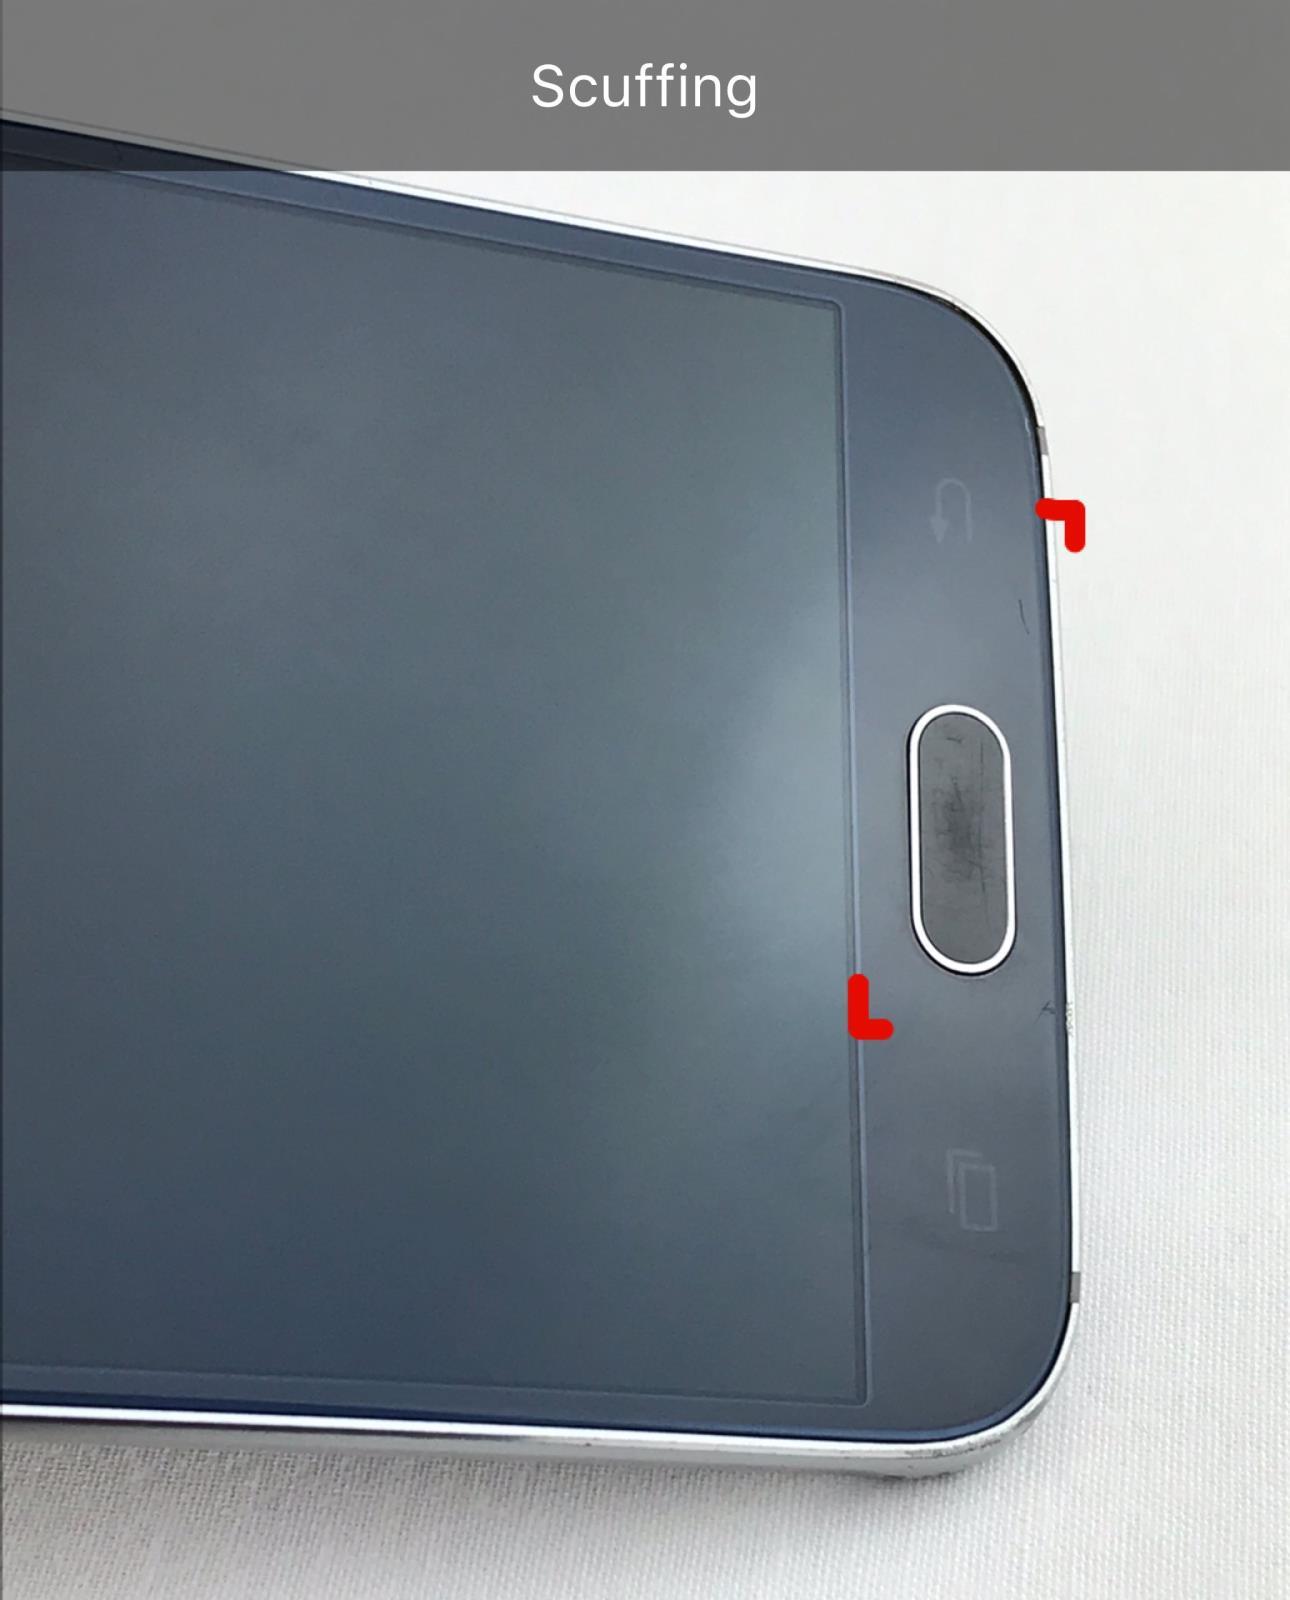 Samsung Galaxy S6 SM-S907VL 32GB Black Sapphire! For Straight Talk